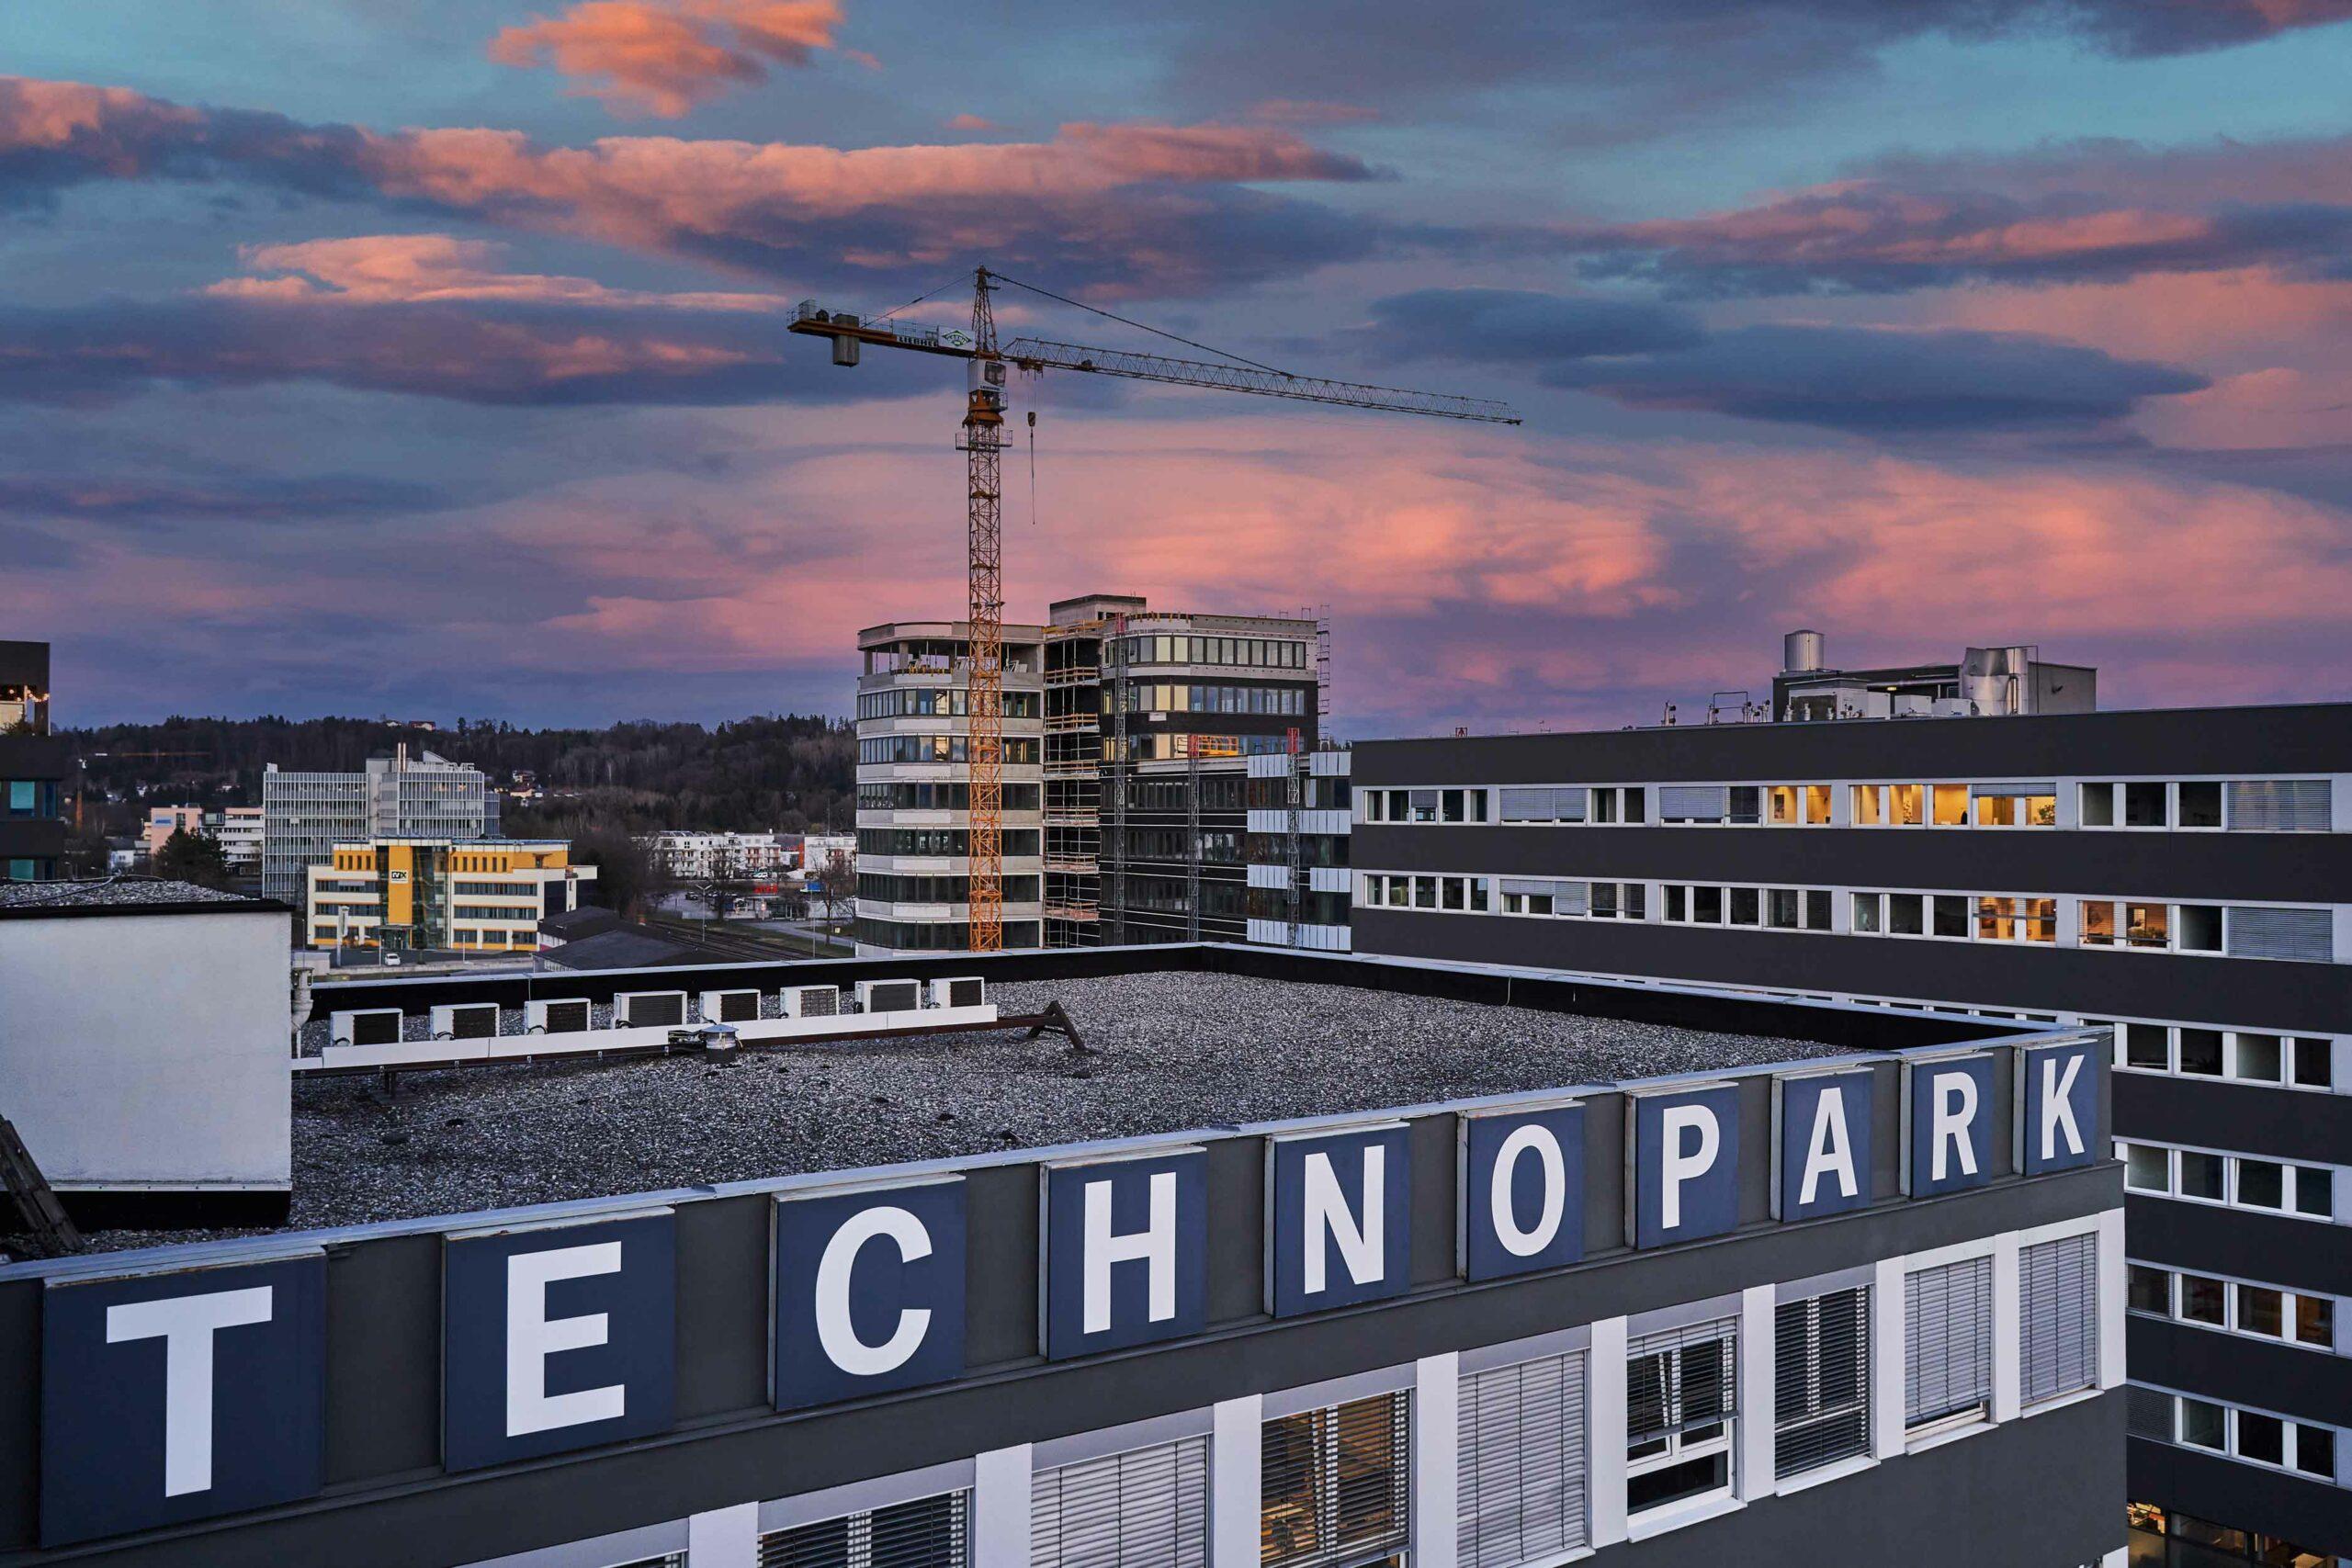 Technopark Raaba by Prontolux